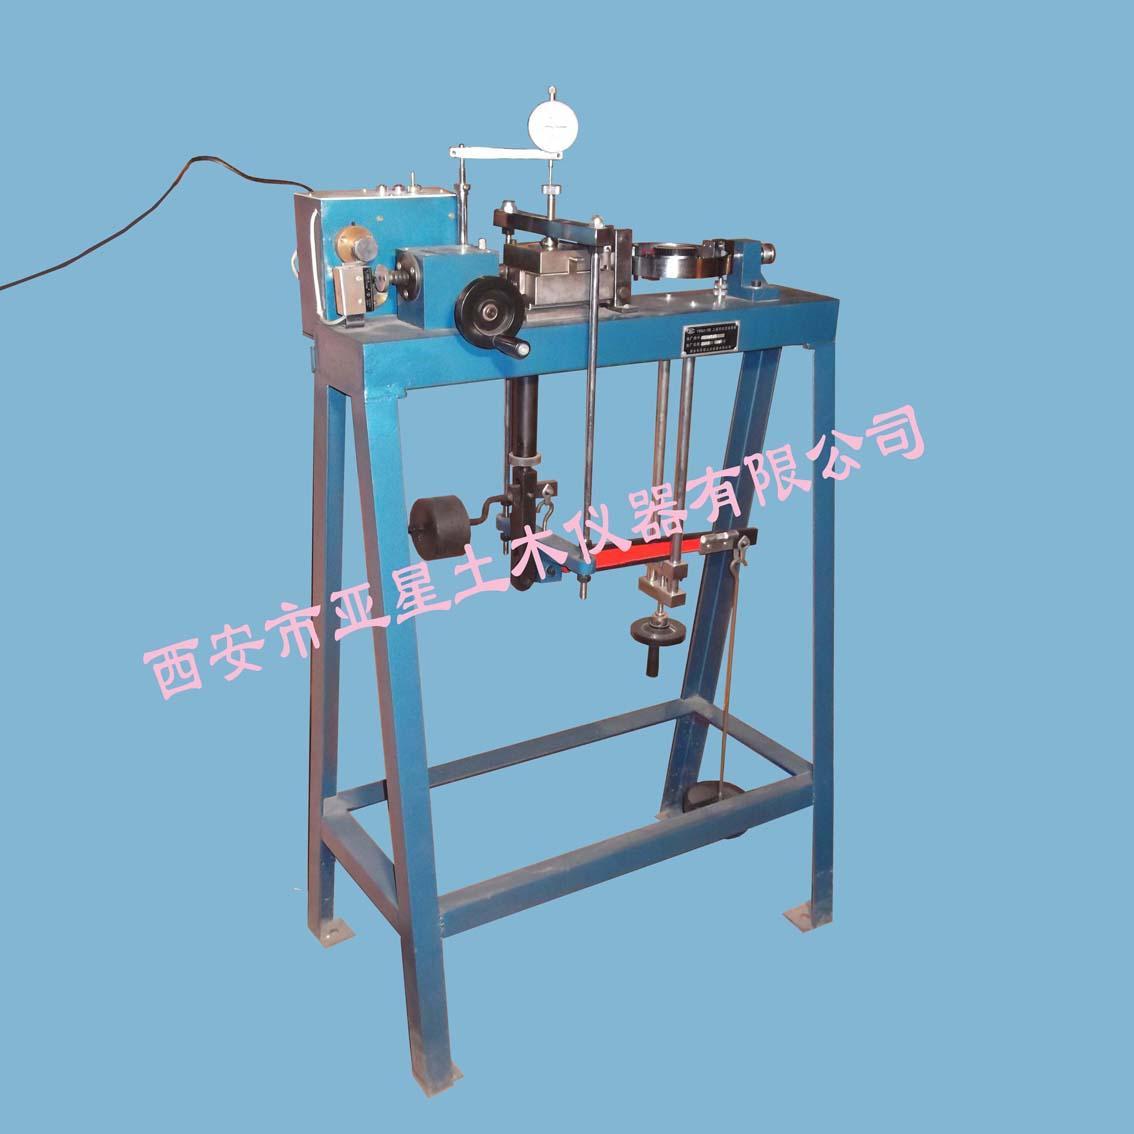 C012数显等应变控制式直剪仪(无极调速)YEDJ-7